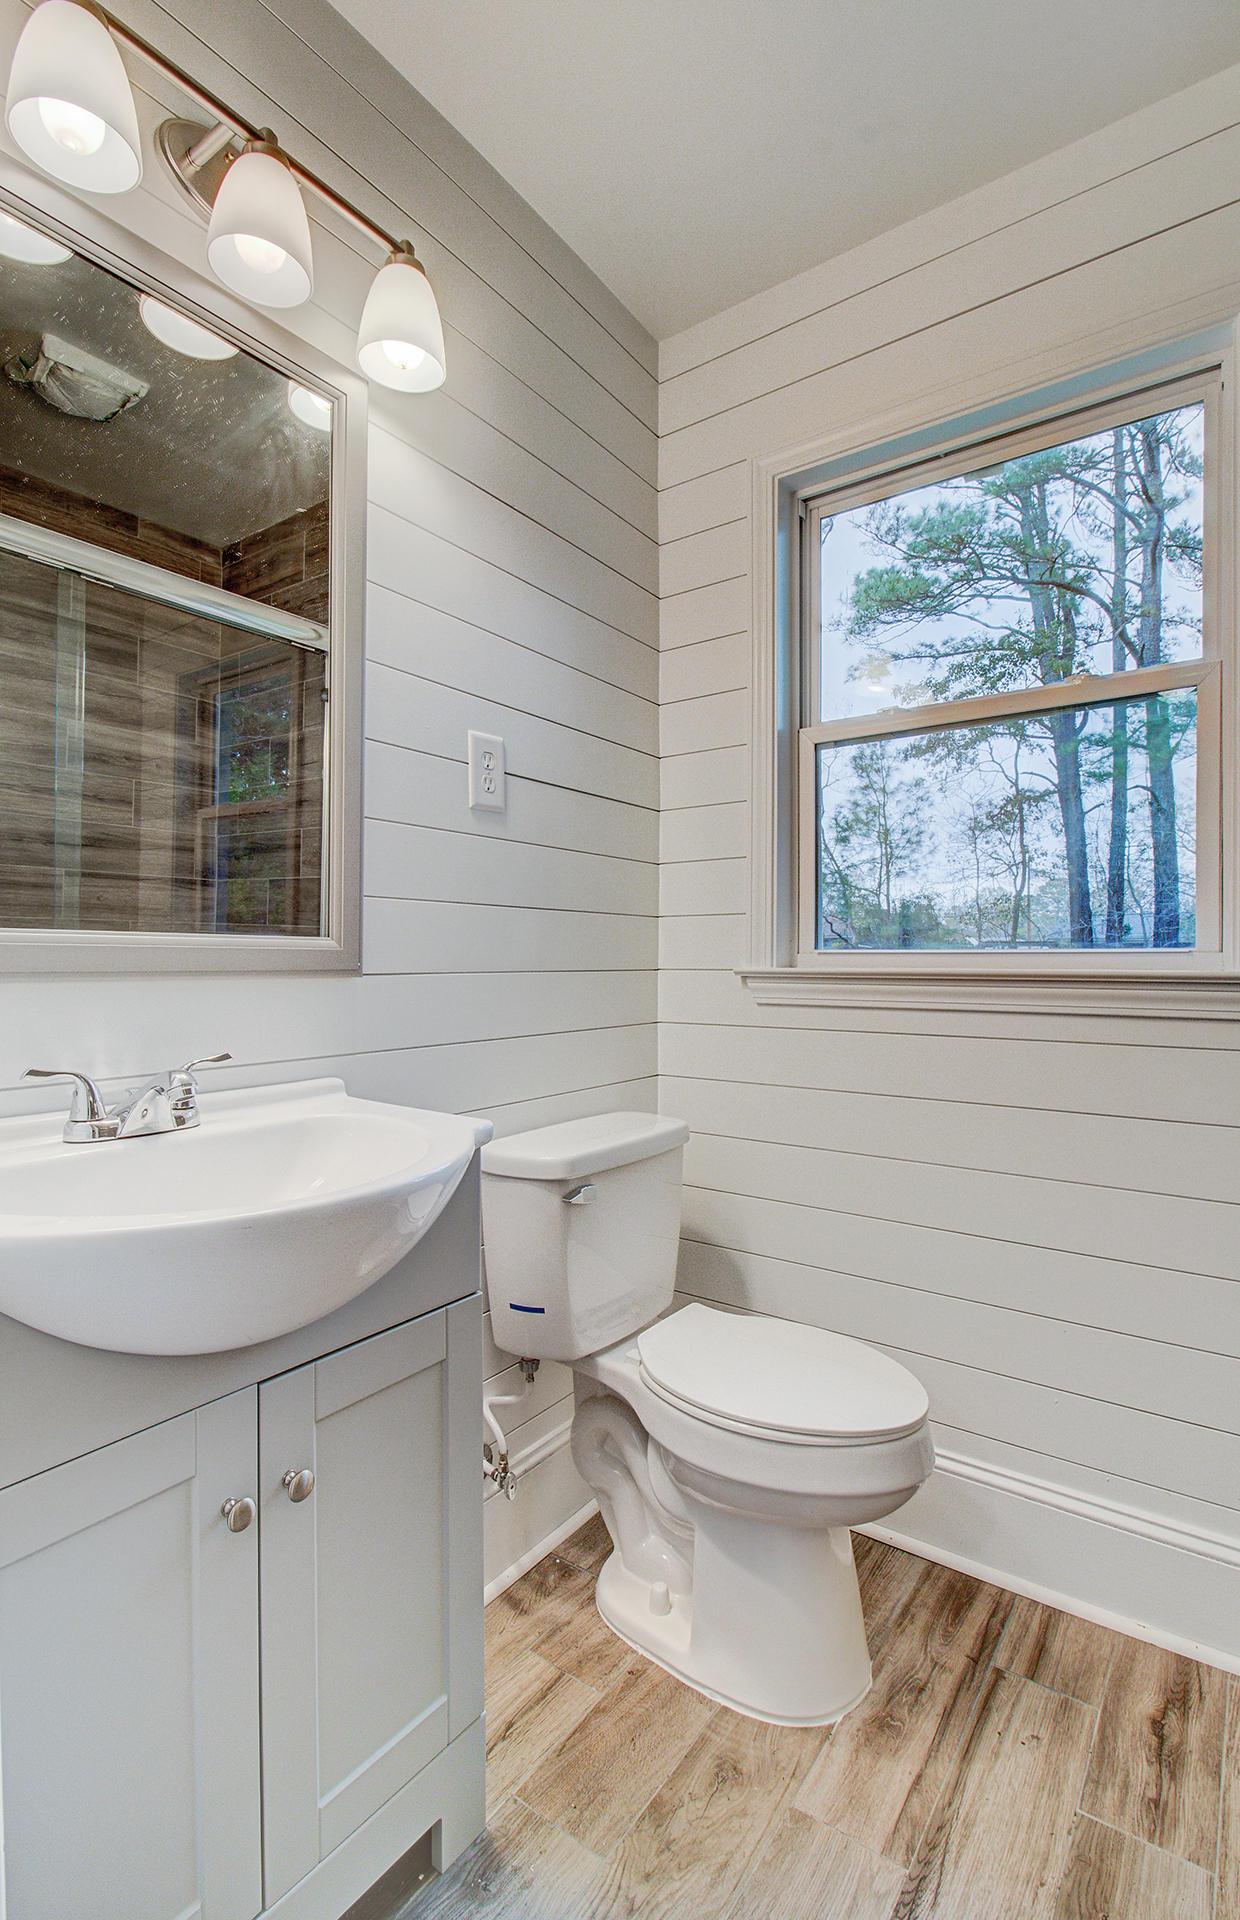 Sedgefield Section I Homes For Sale - 30 Aldene, Goose Creek, SC - 20